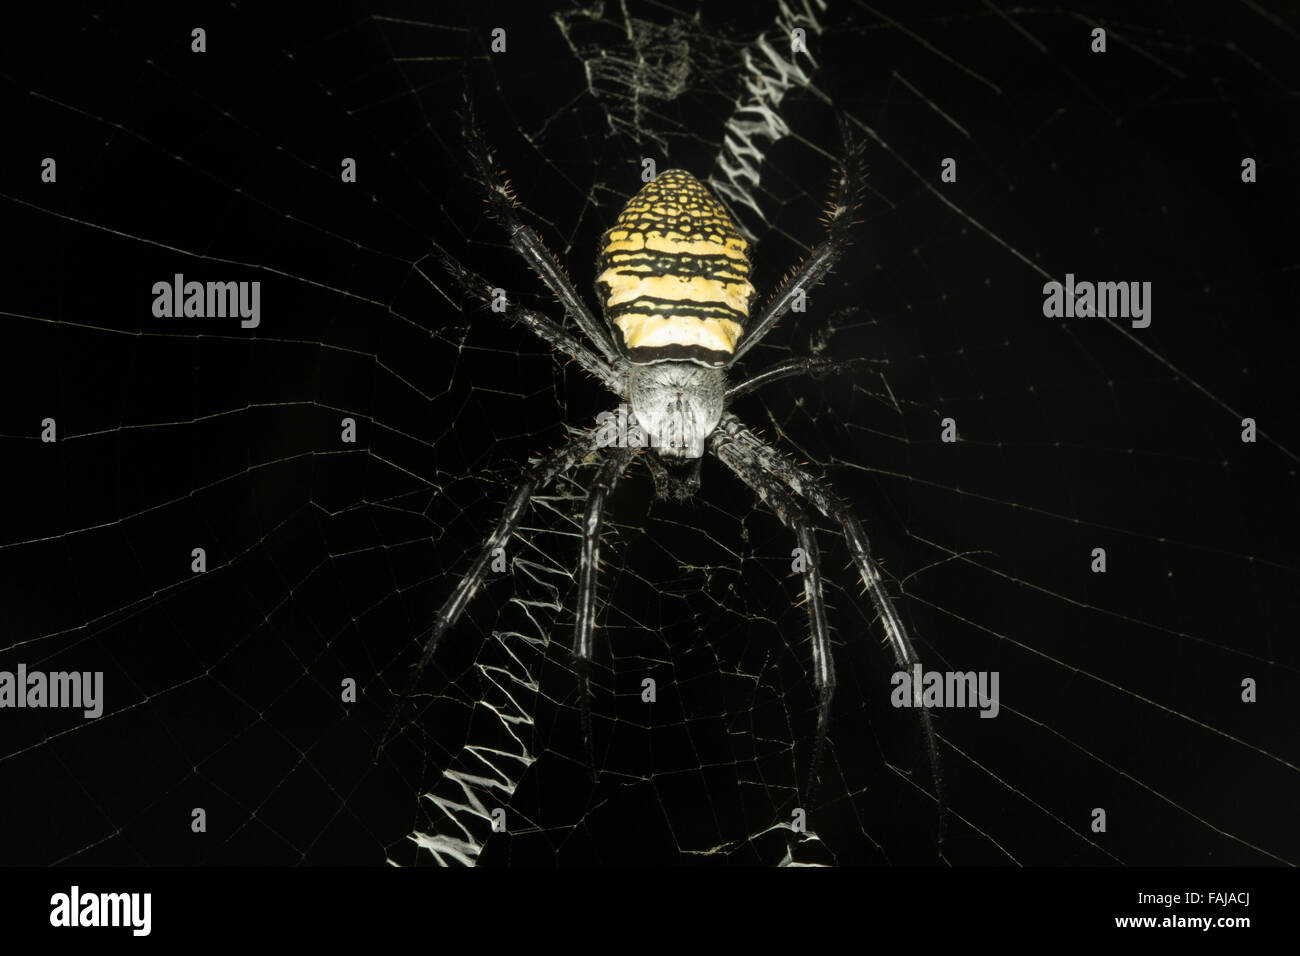 Signatur-Spider, Wespenspinne SP., NZB, Bangalore, Indien Stockbild